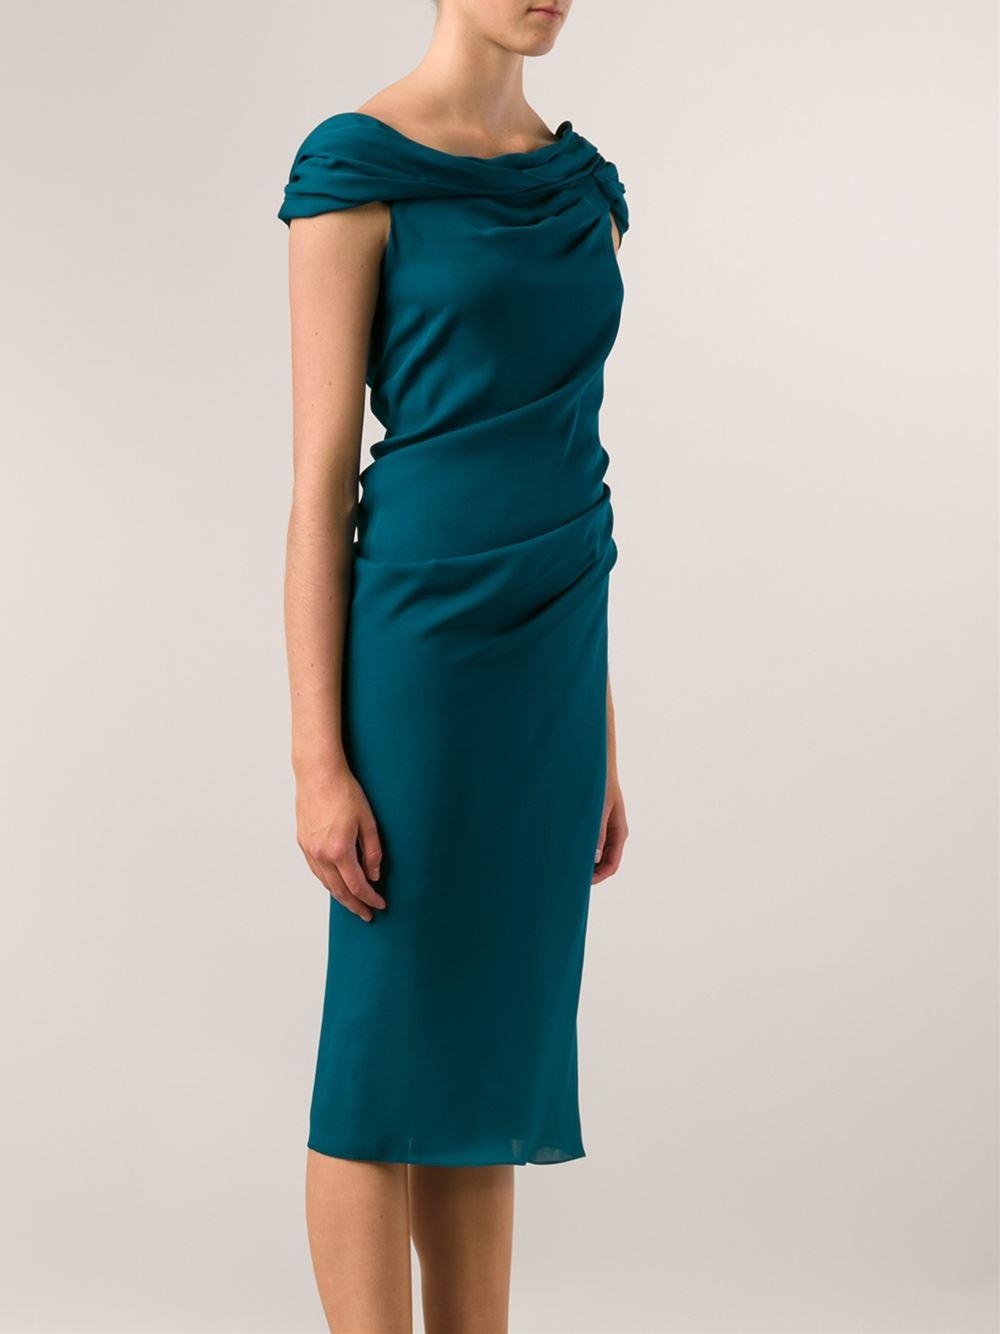 Lyst Cushnie Et Ochs Off The Shoulder Dress In Blue